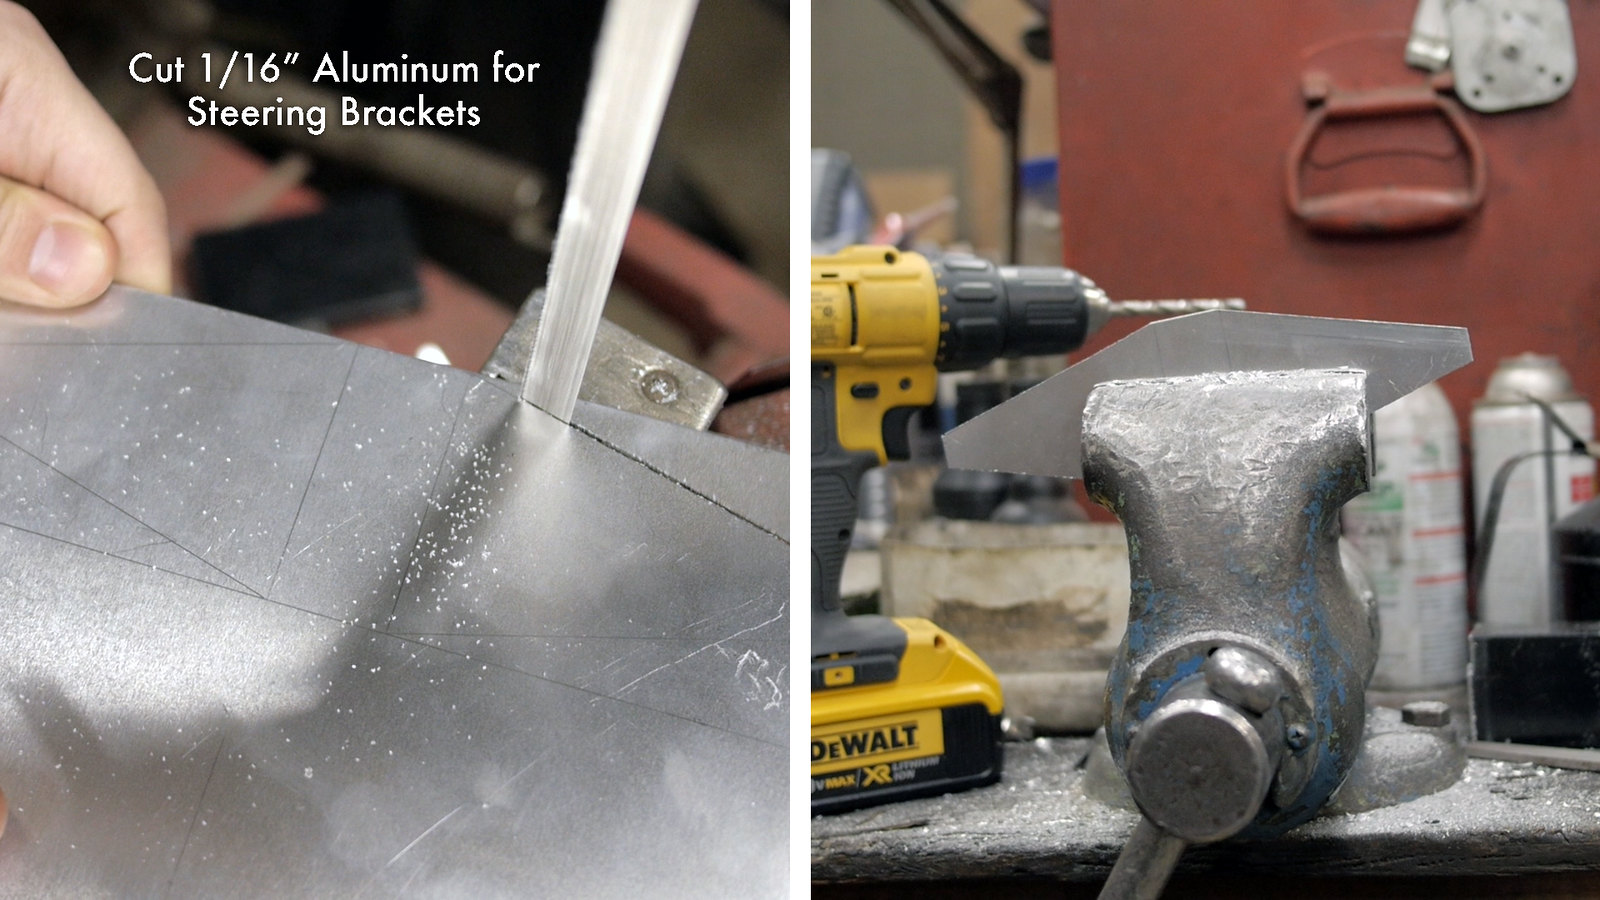 Cut Aluminum for Steering Brackets